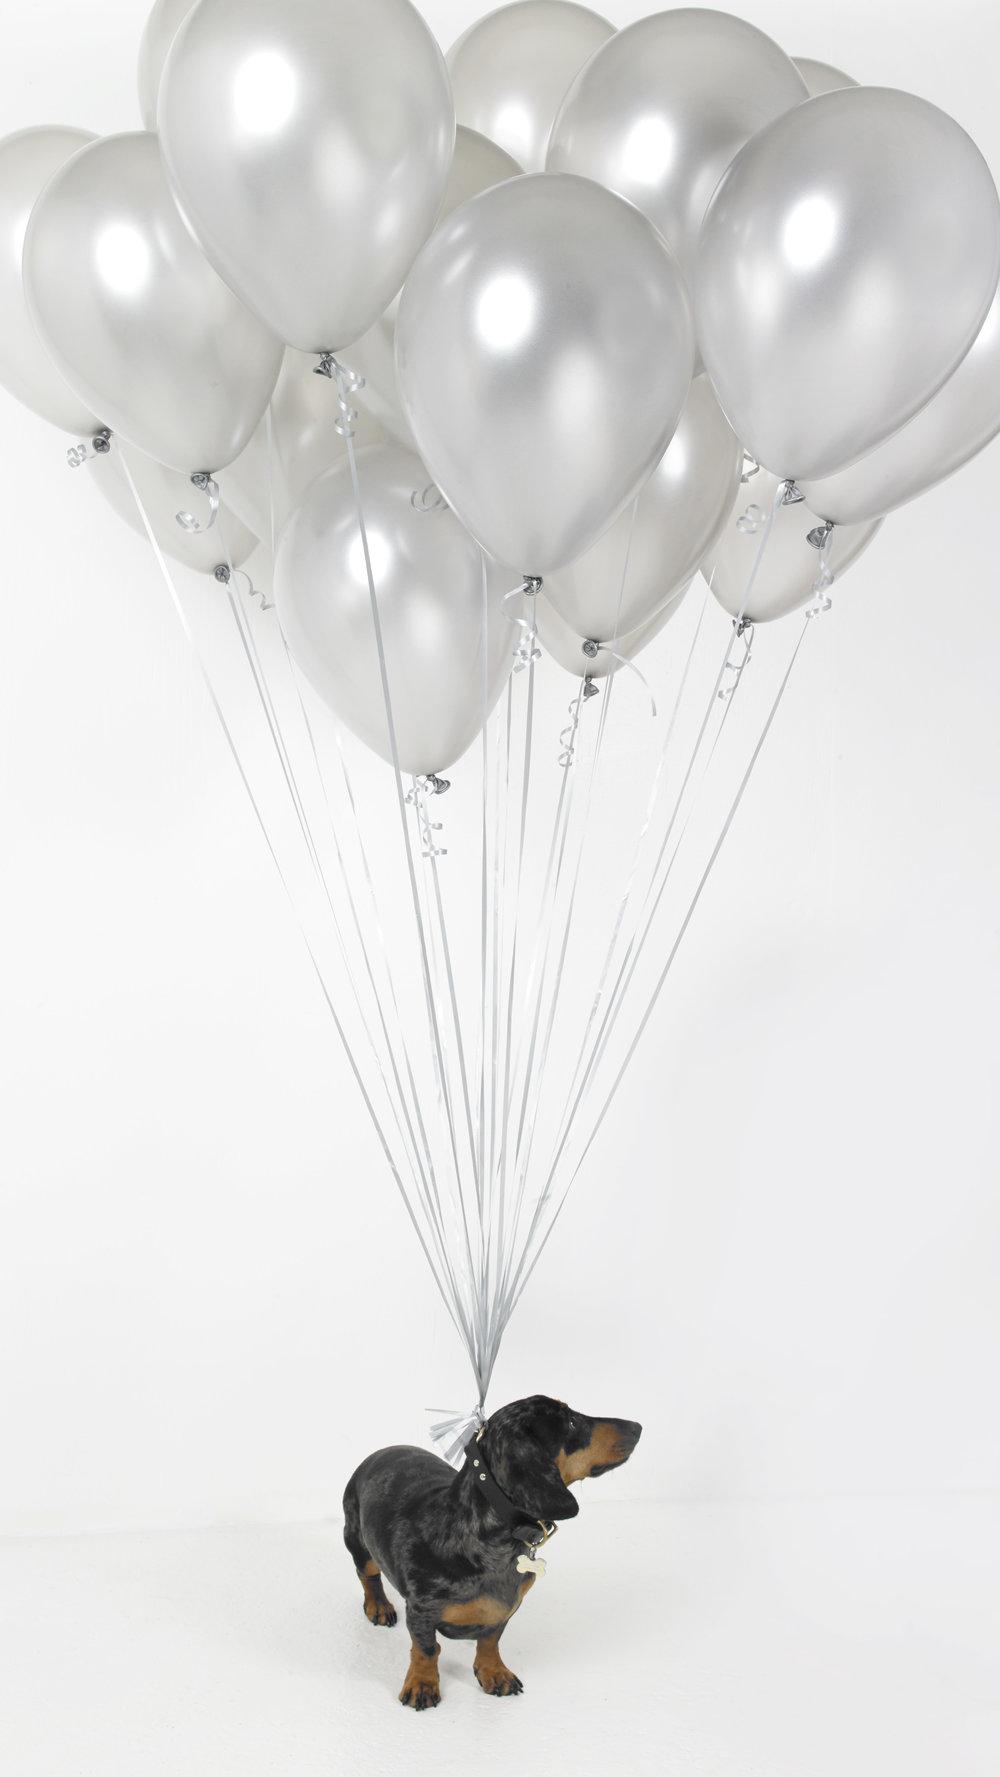 Balloon Bill